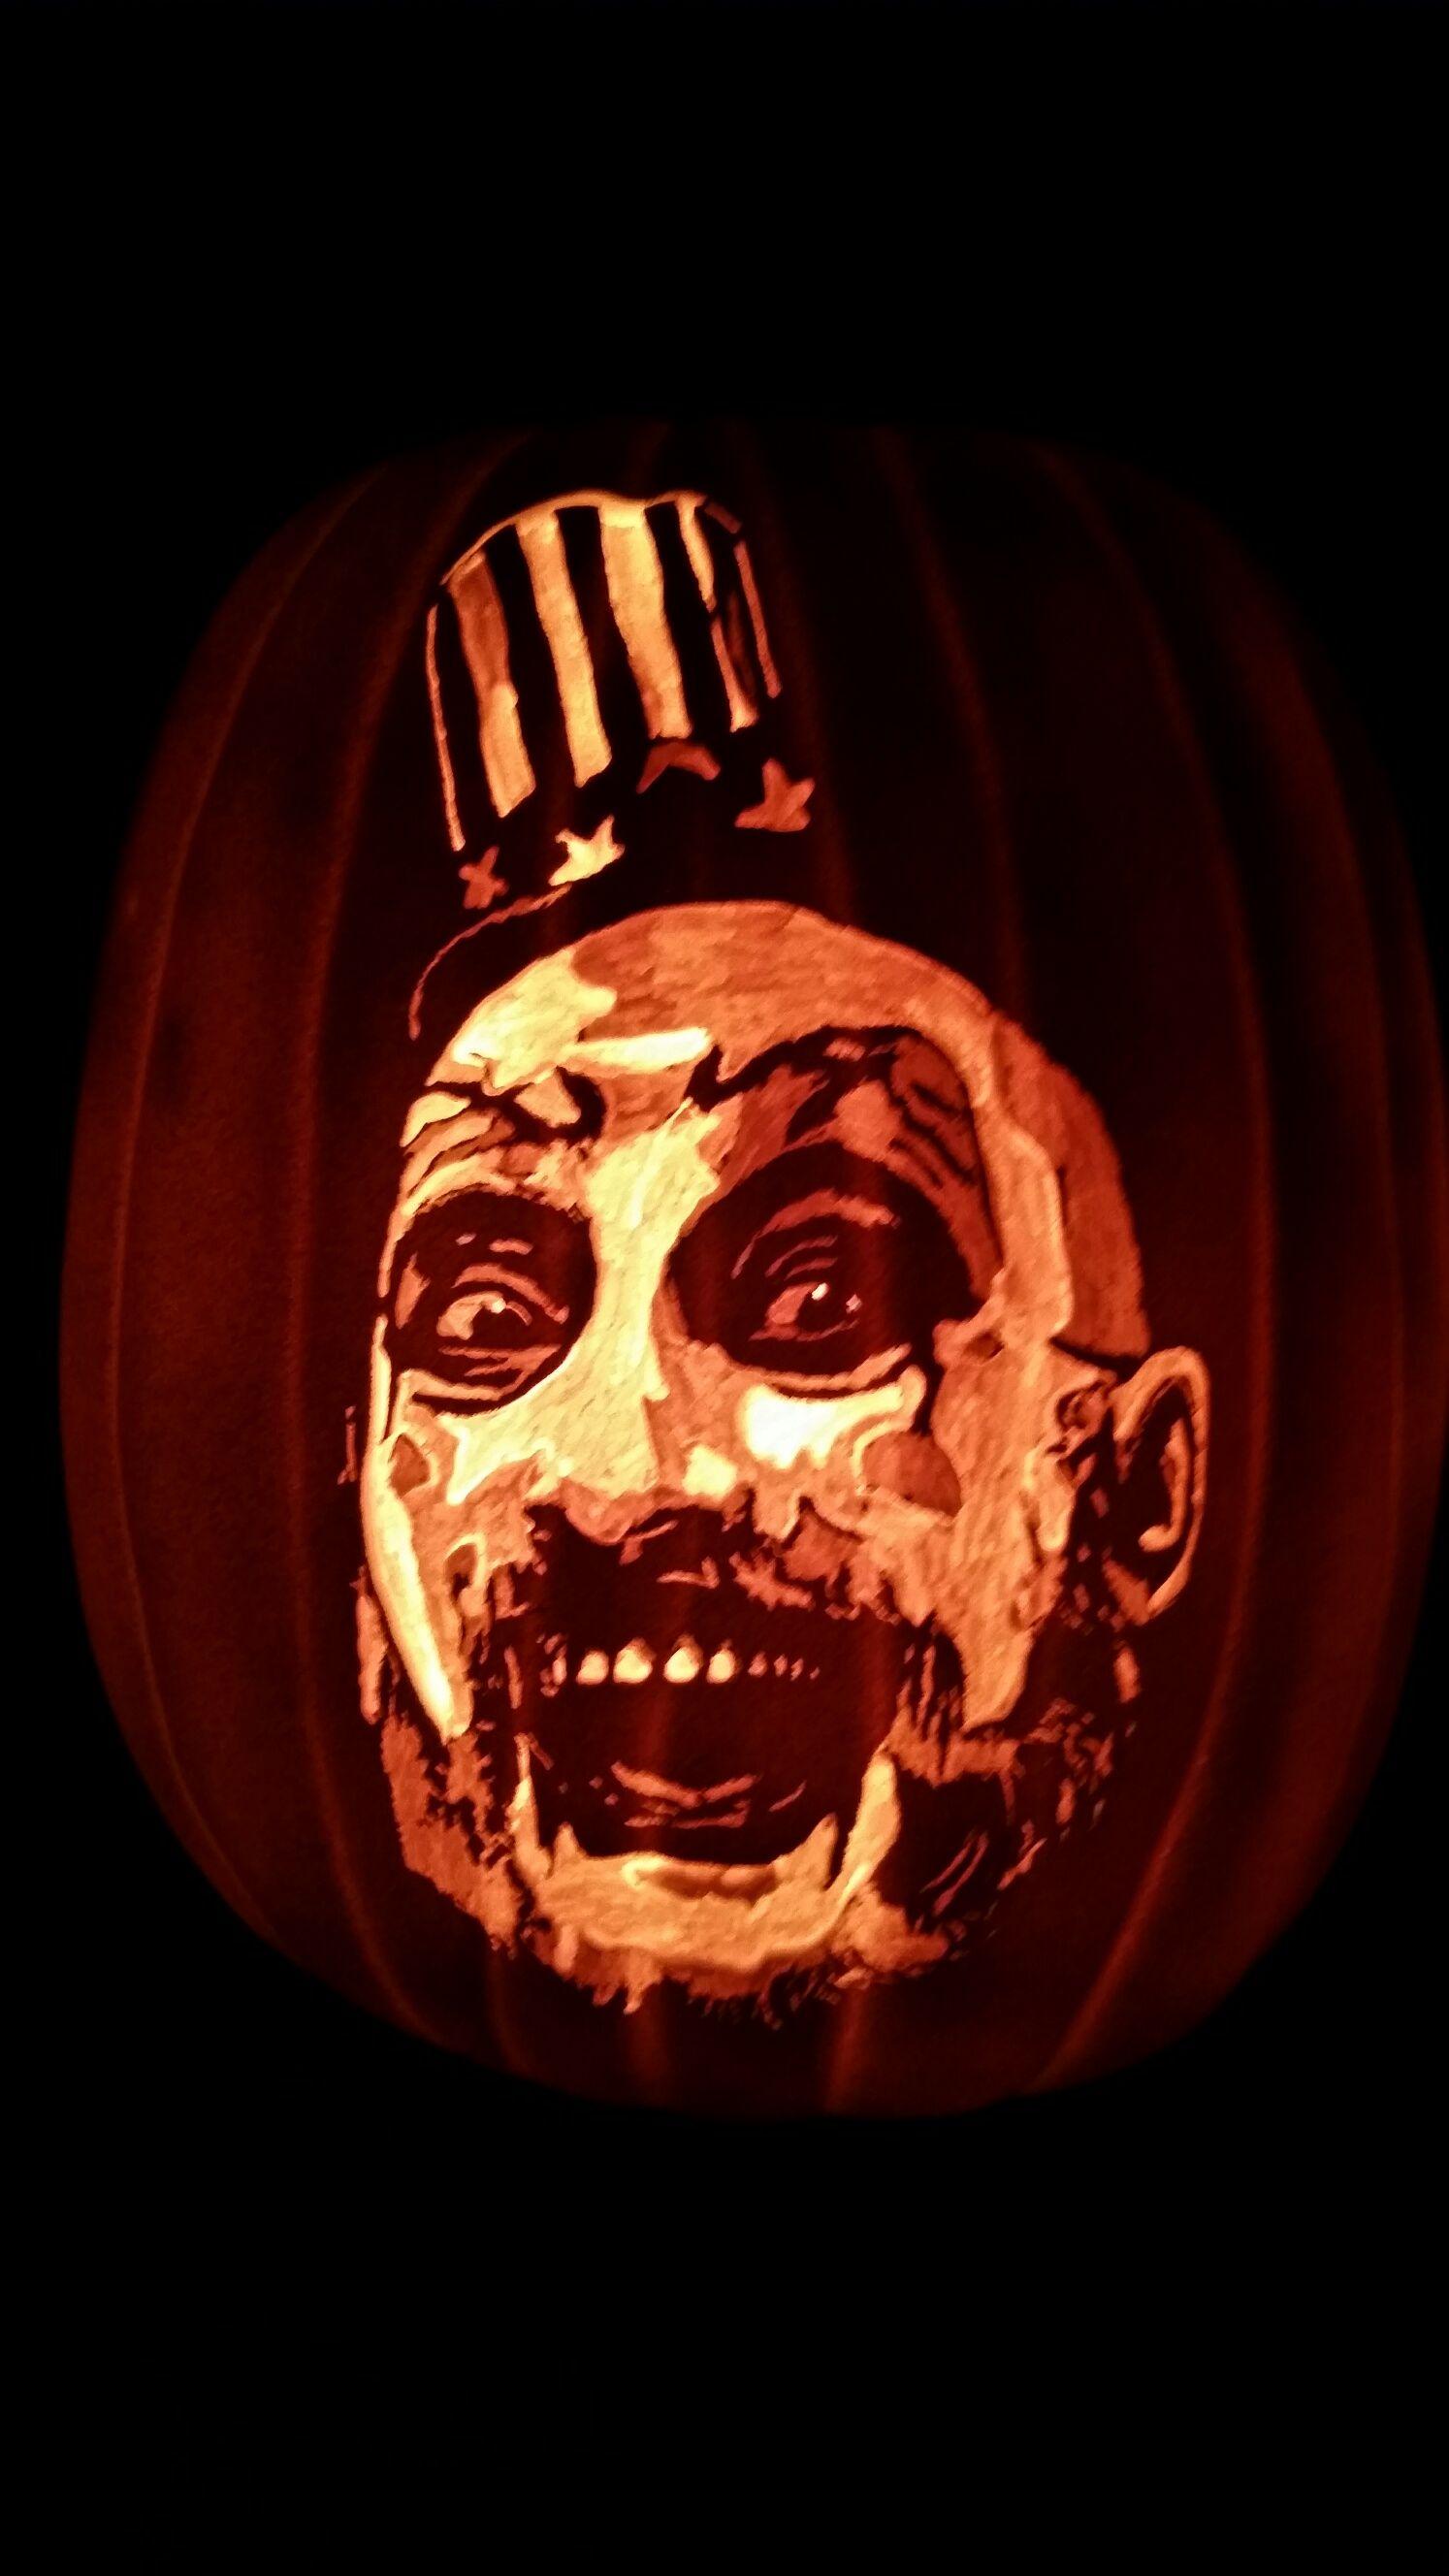 Sid Haig Captain Spaulding Pumpkins Carved Pinterest Pumpkin